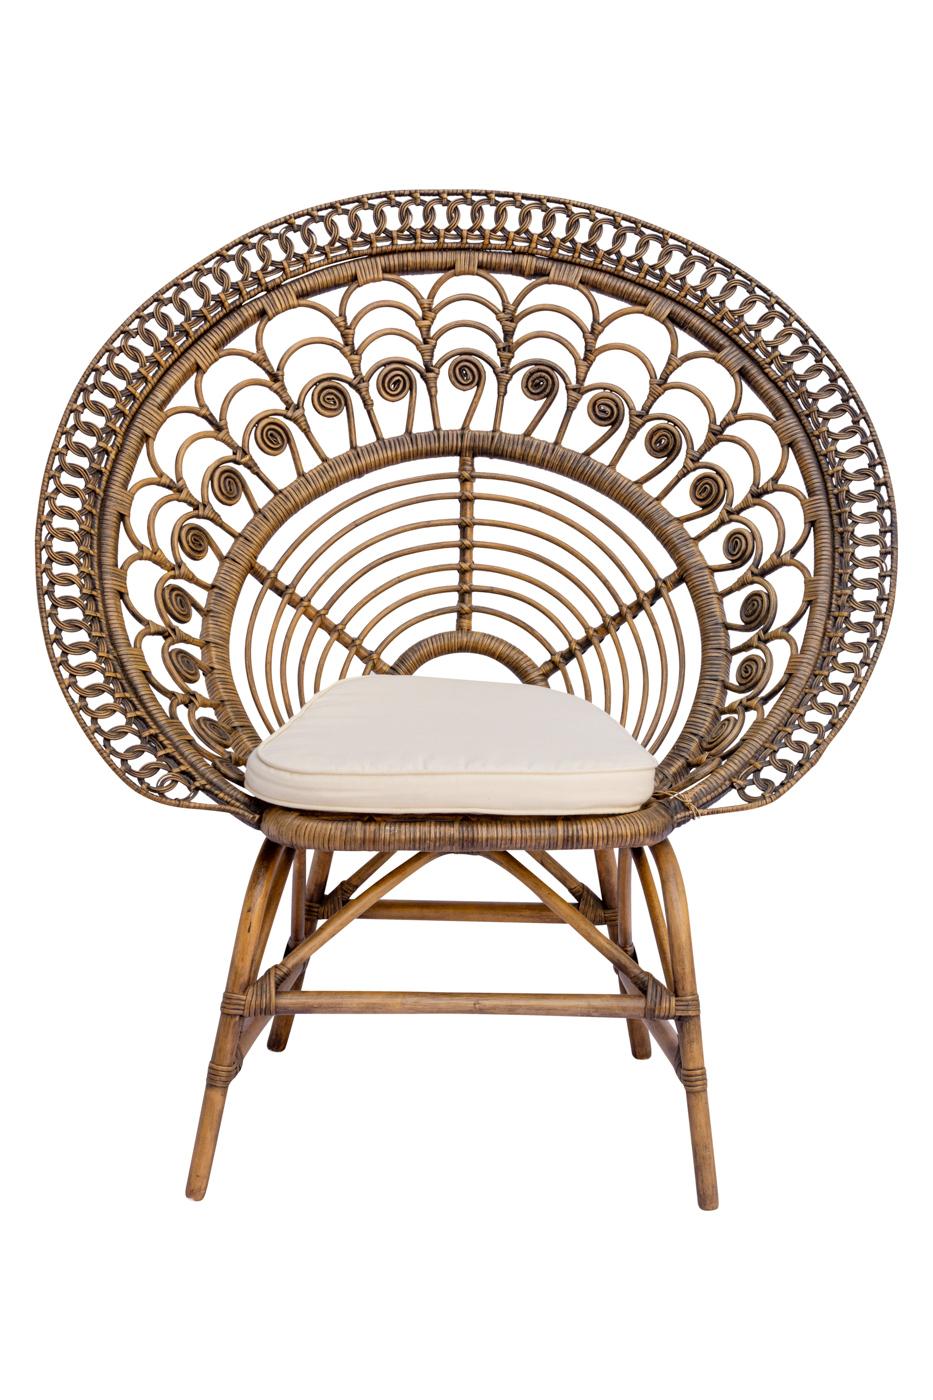 Peacock chair in rattan